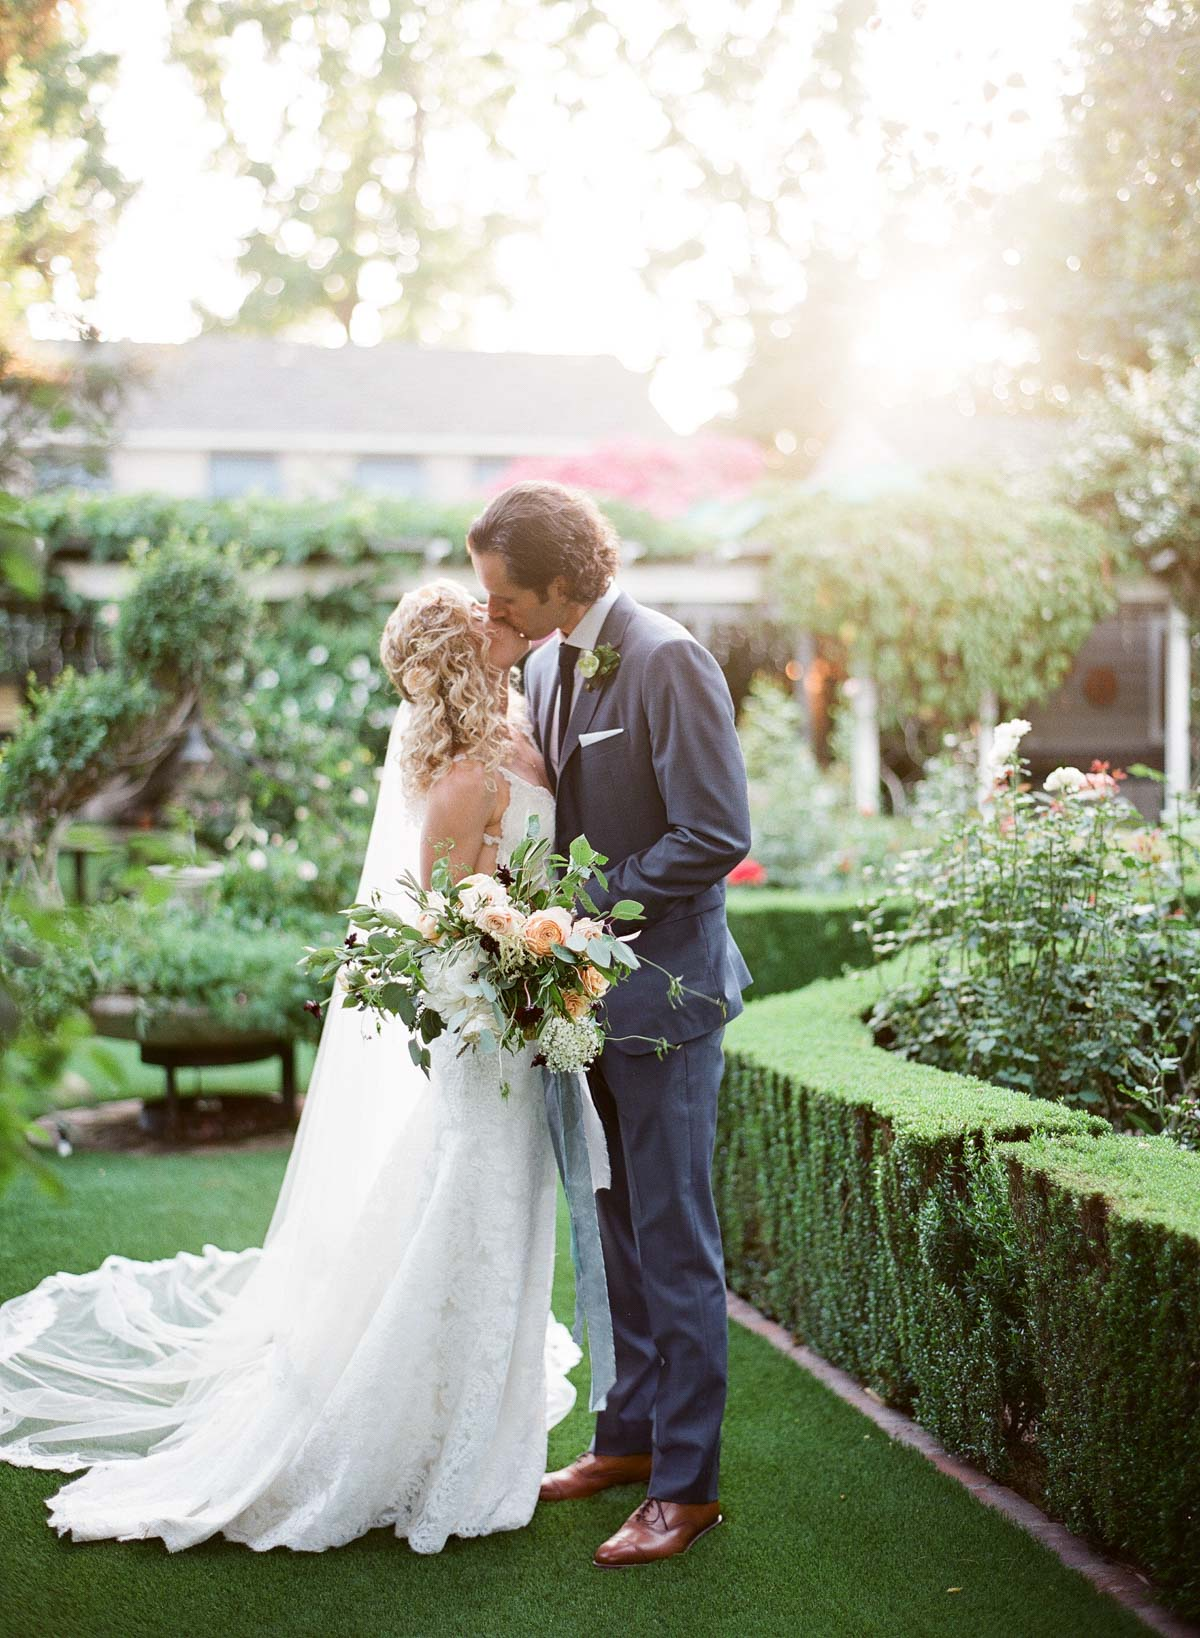 Lauren_Travis_Backyard_California_Wedding (c) Greg_Finck-080.jpg